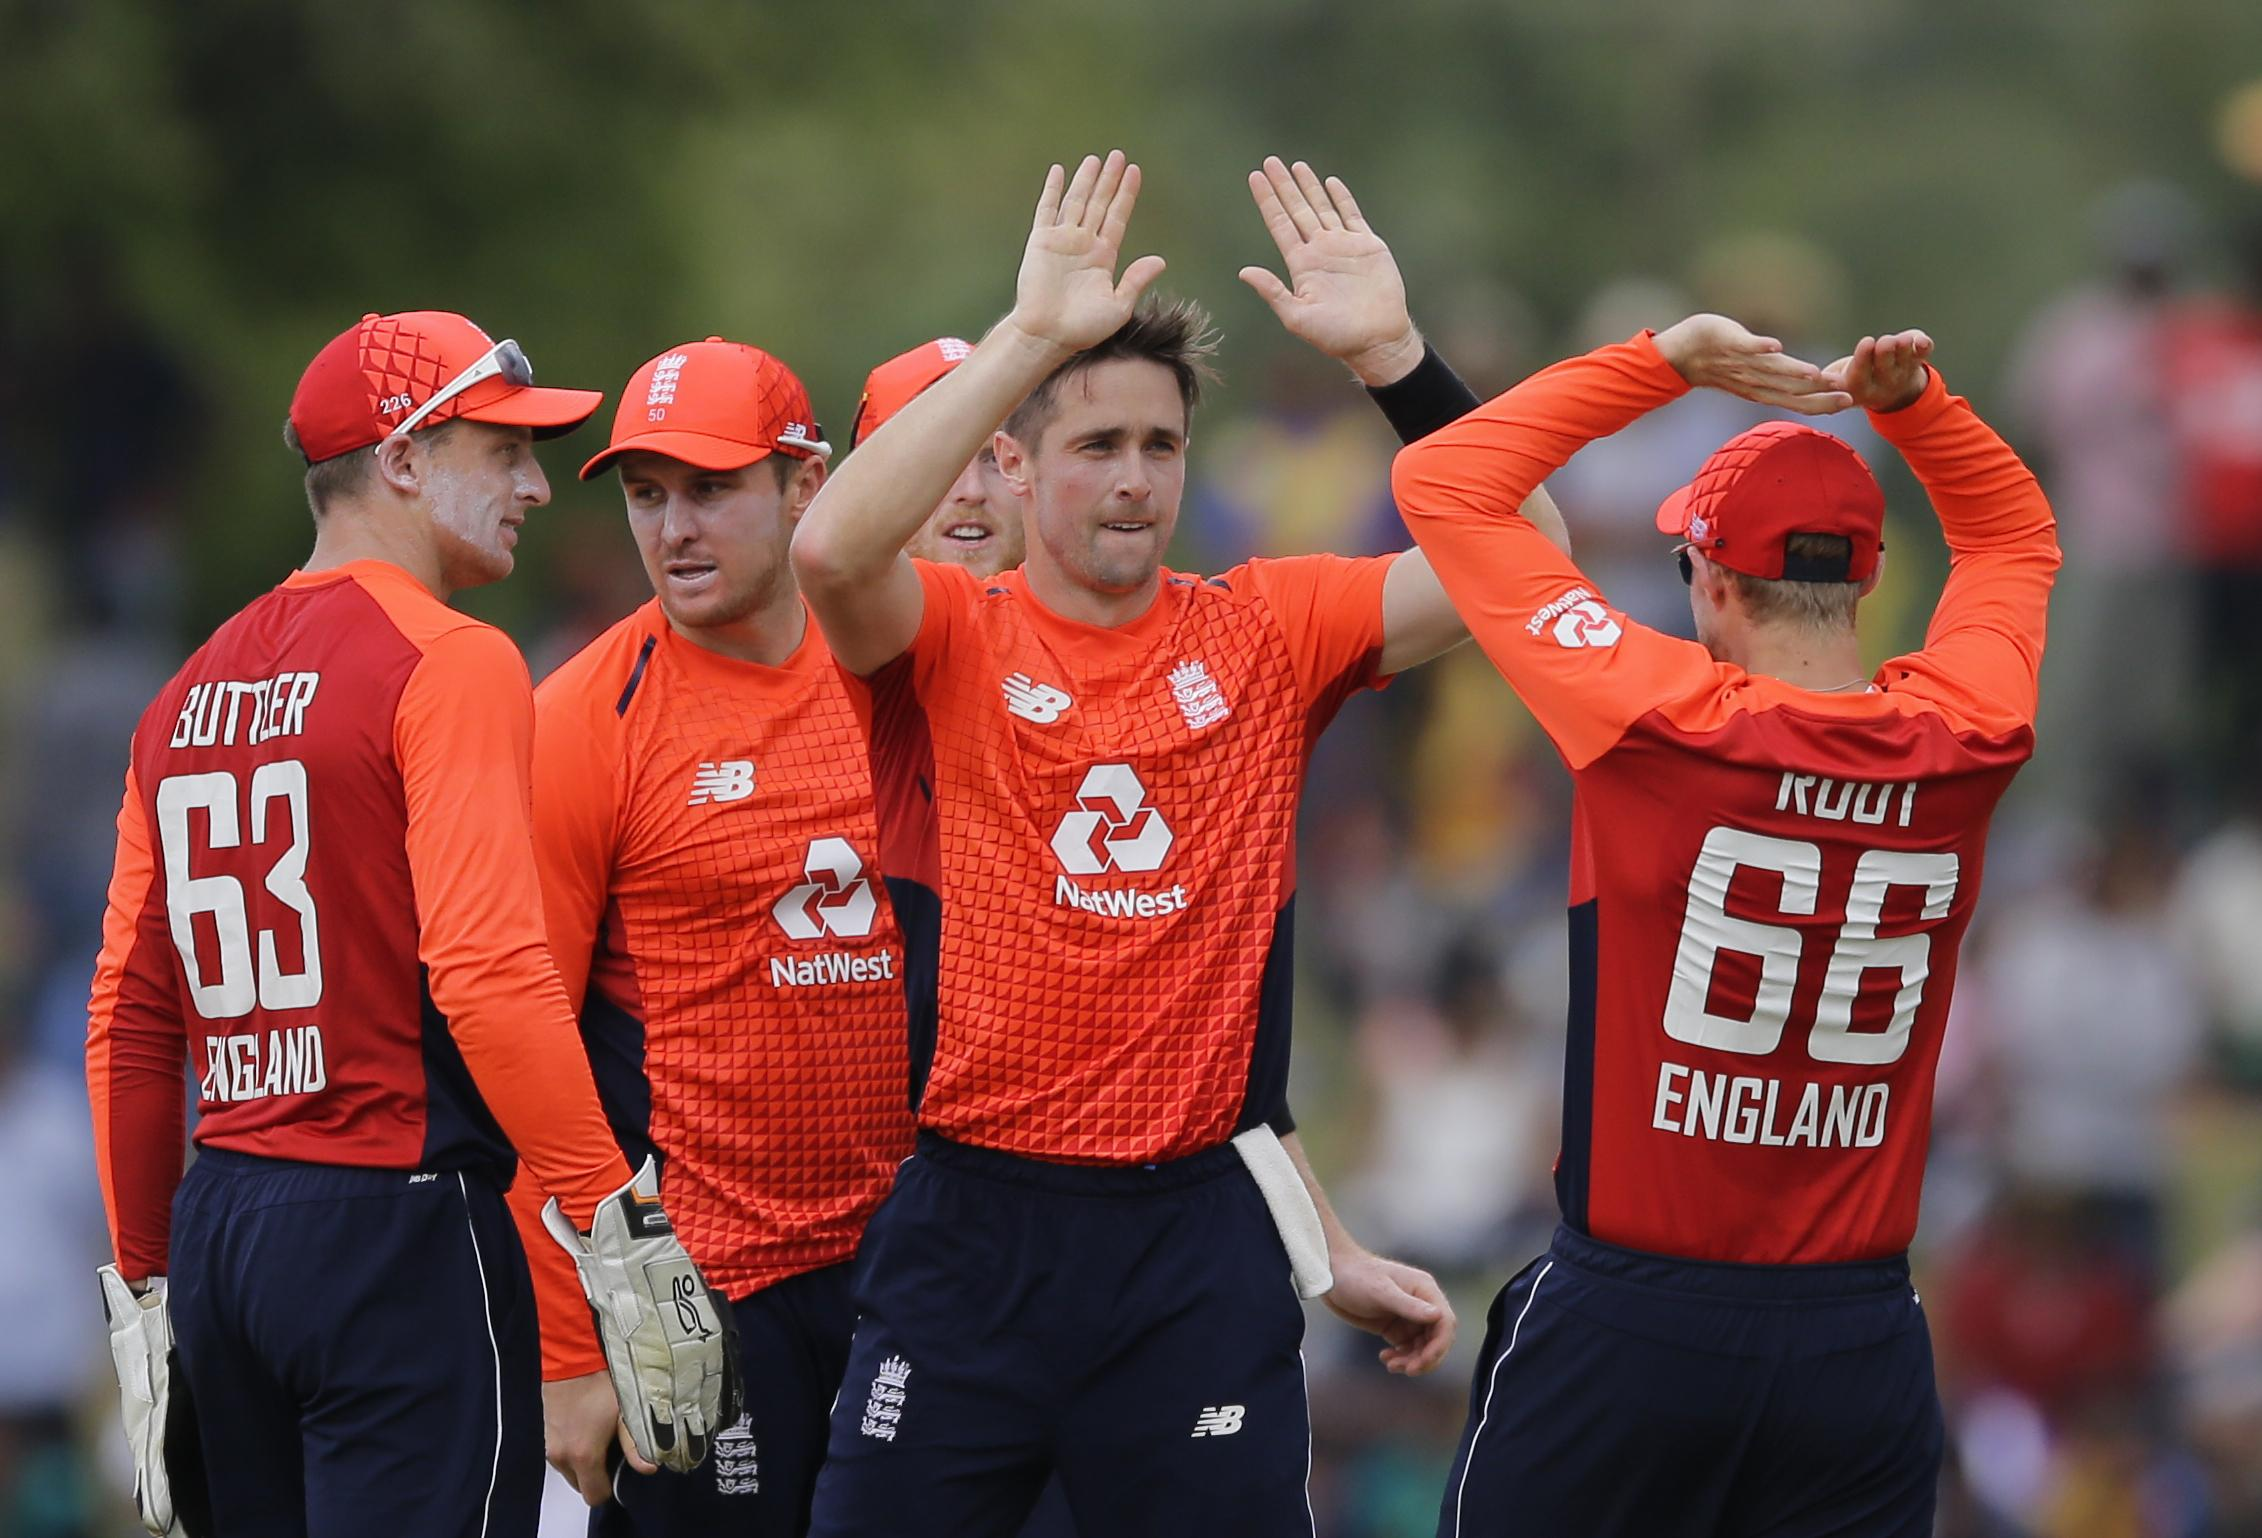 England beat Sri Lanka by 31 runs in the second ODI via the DLS method